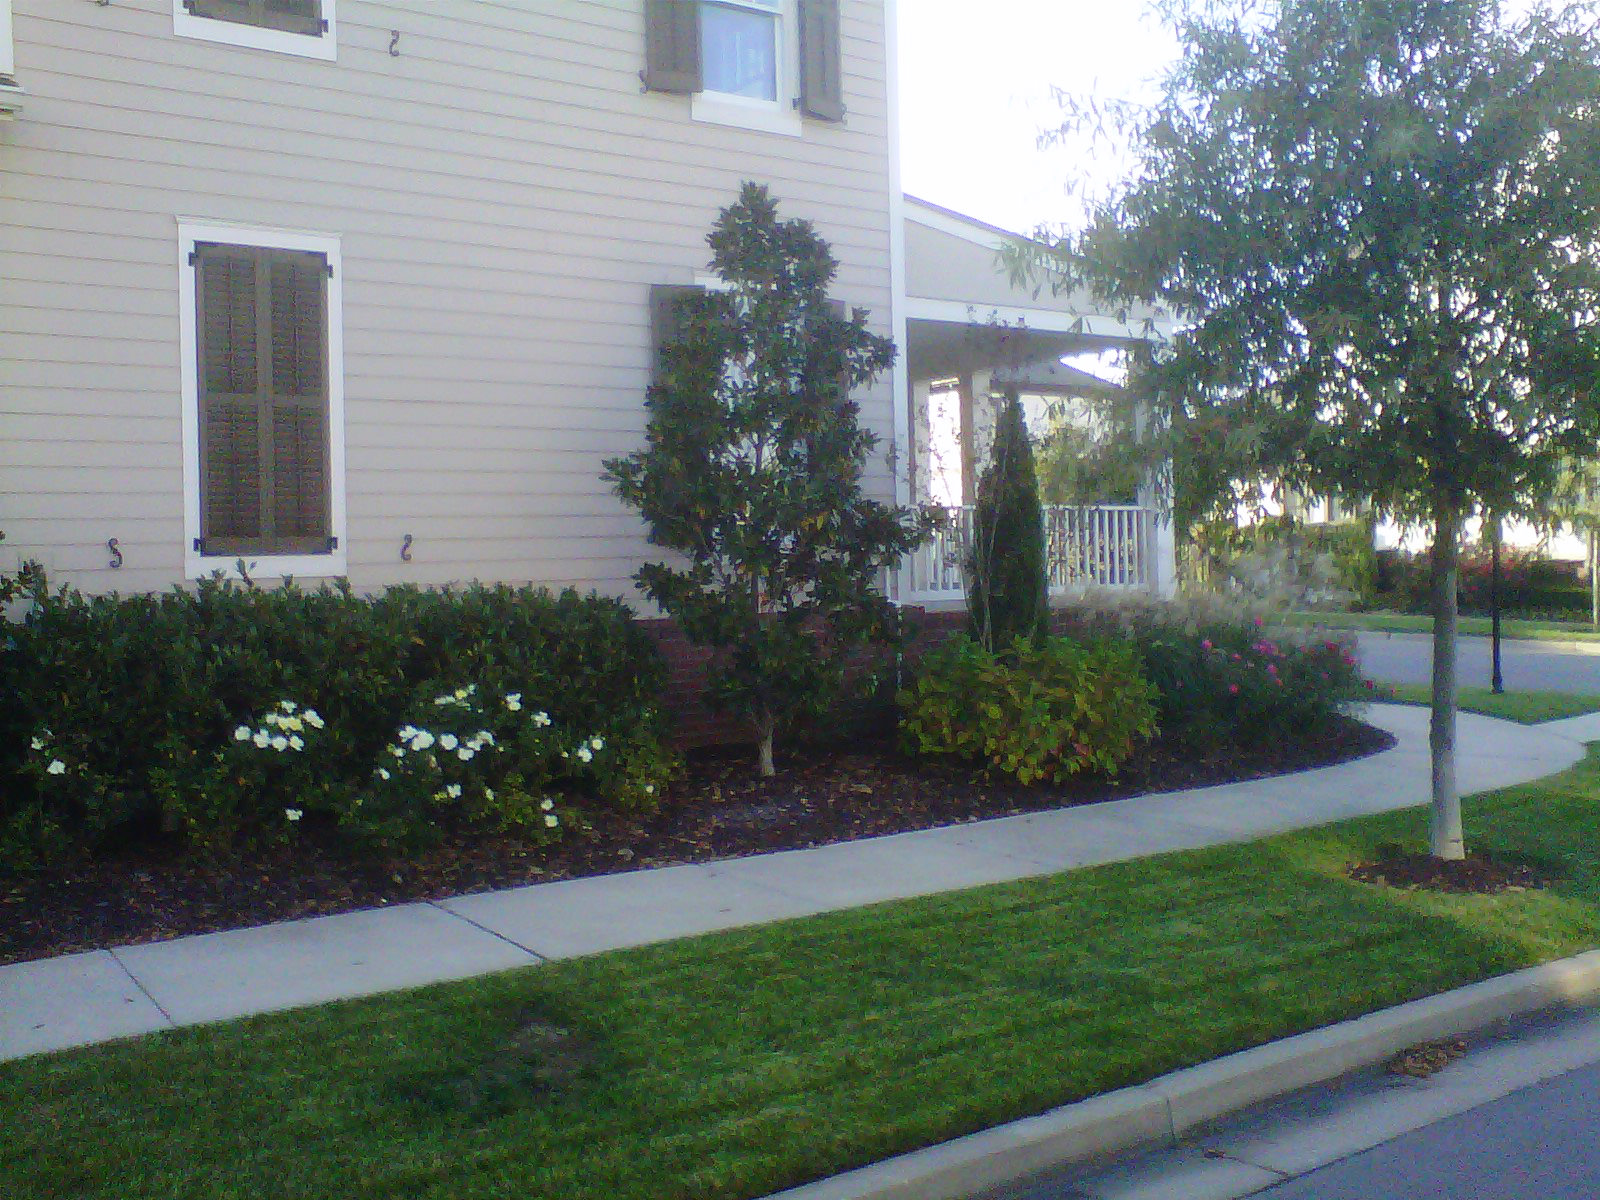 Justin Stelter Landscape Gardening - Modern Suburban Landscaping - 12591621765_b55fa7efa1_o.jpg